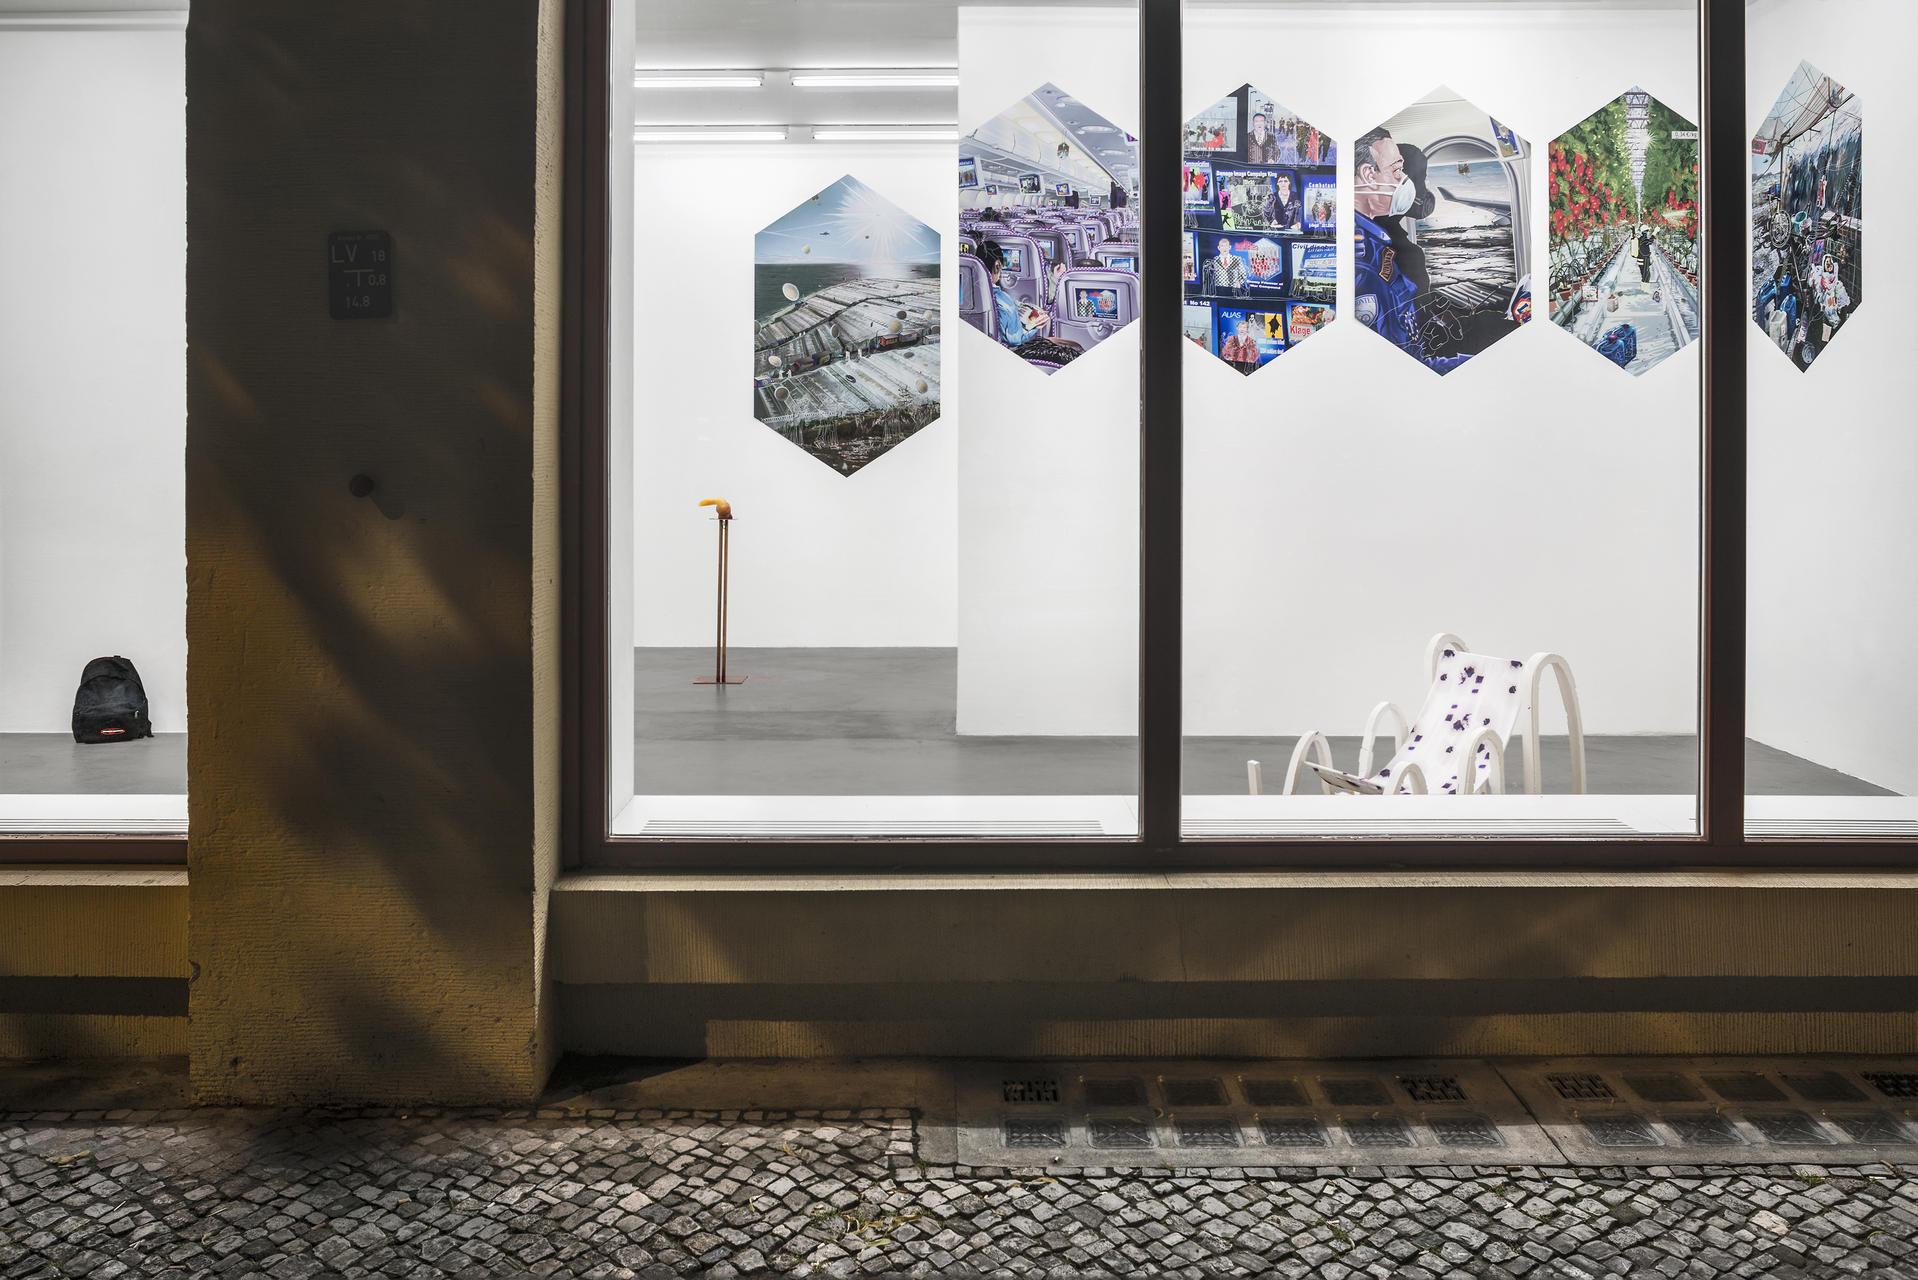 Hundstage_Installation views_2015_6